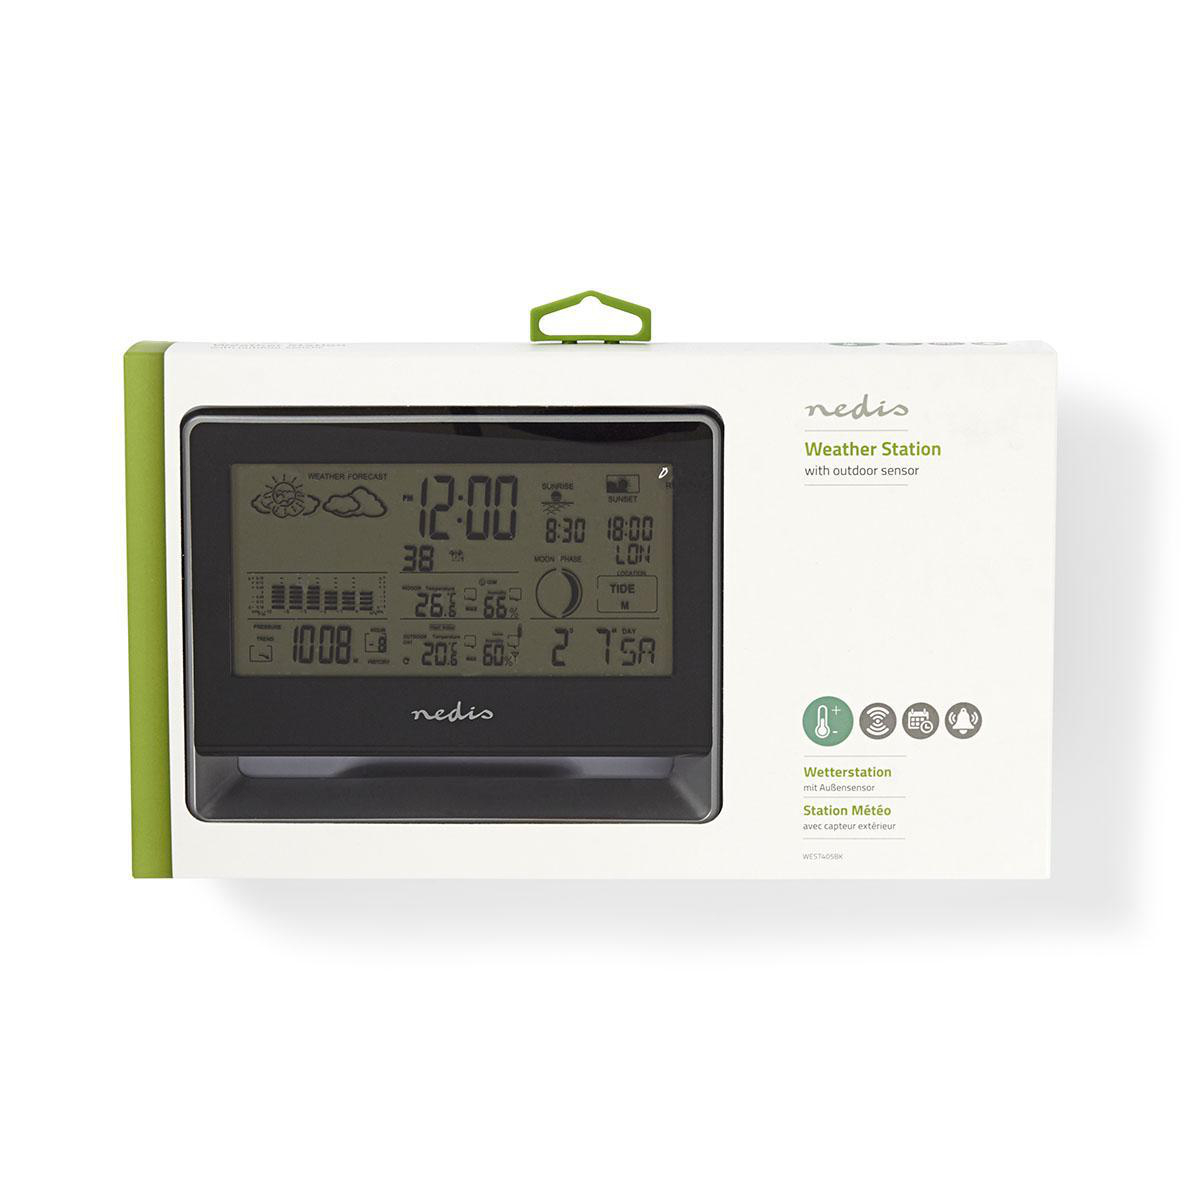 Nedis Weather Station Wireless sensor Alarm clock Weather Forecast